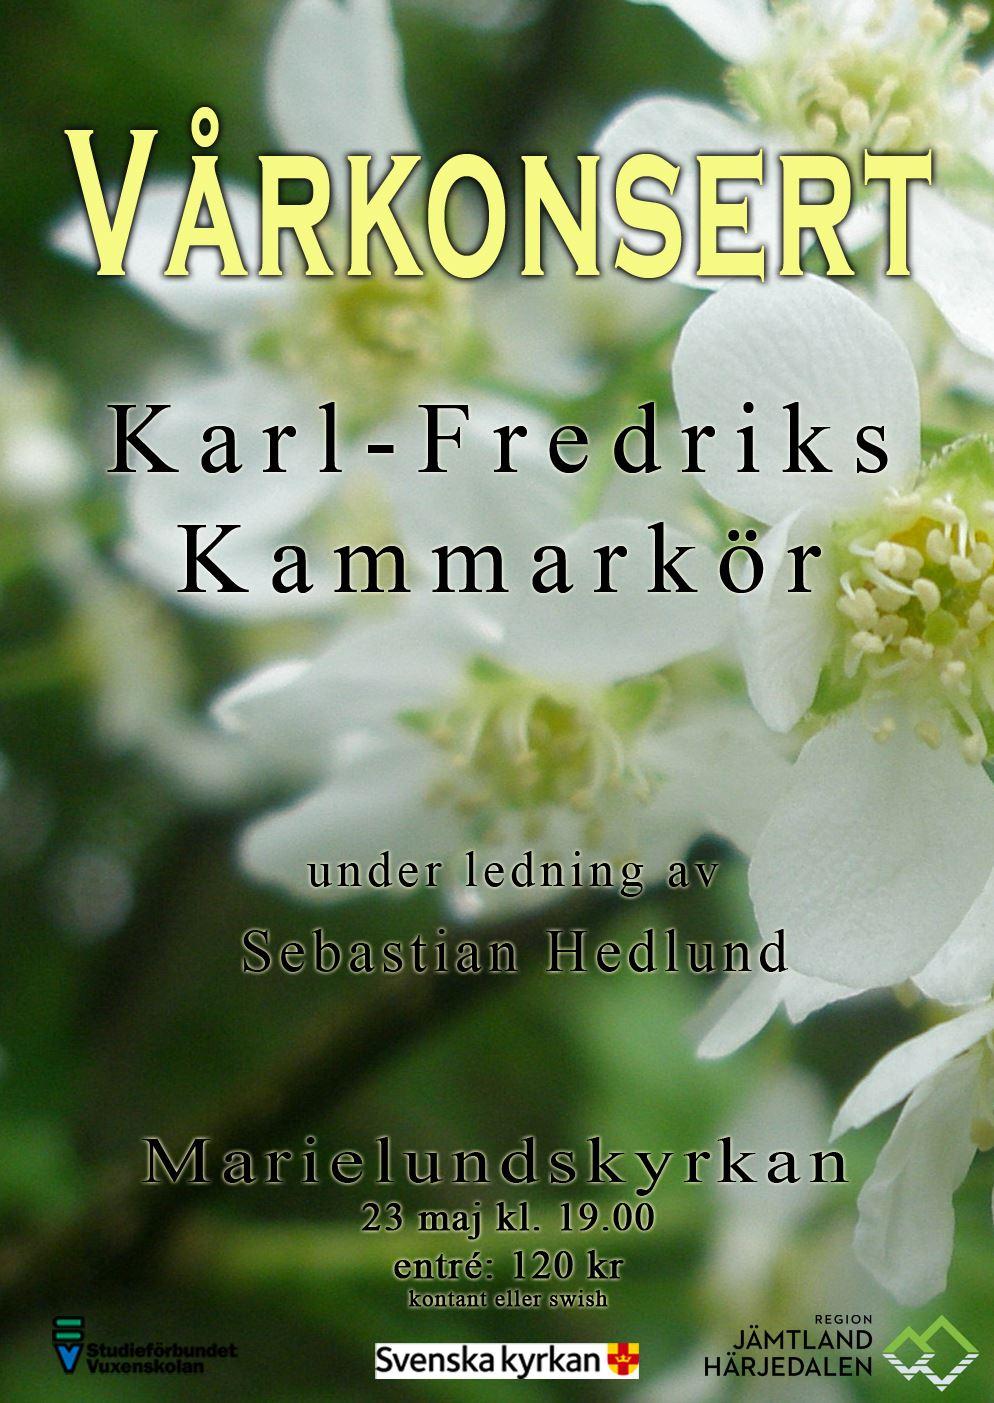 Karl-Fredriks Choir